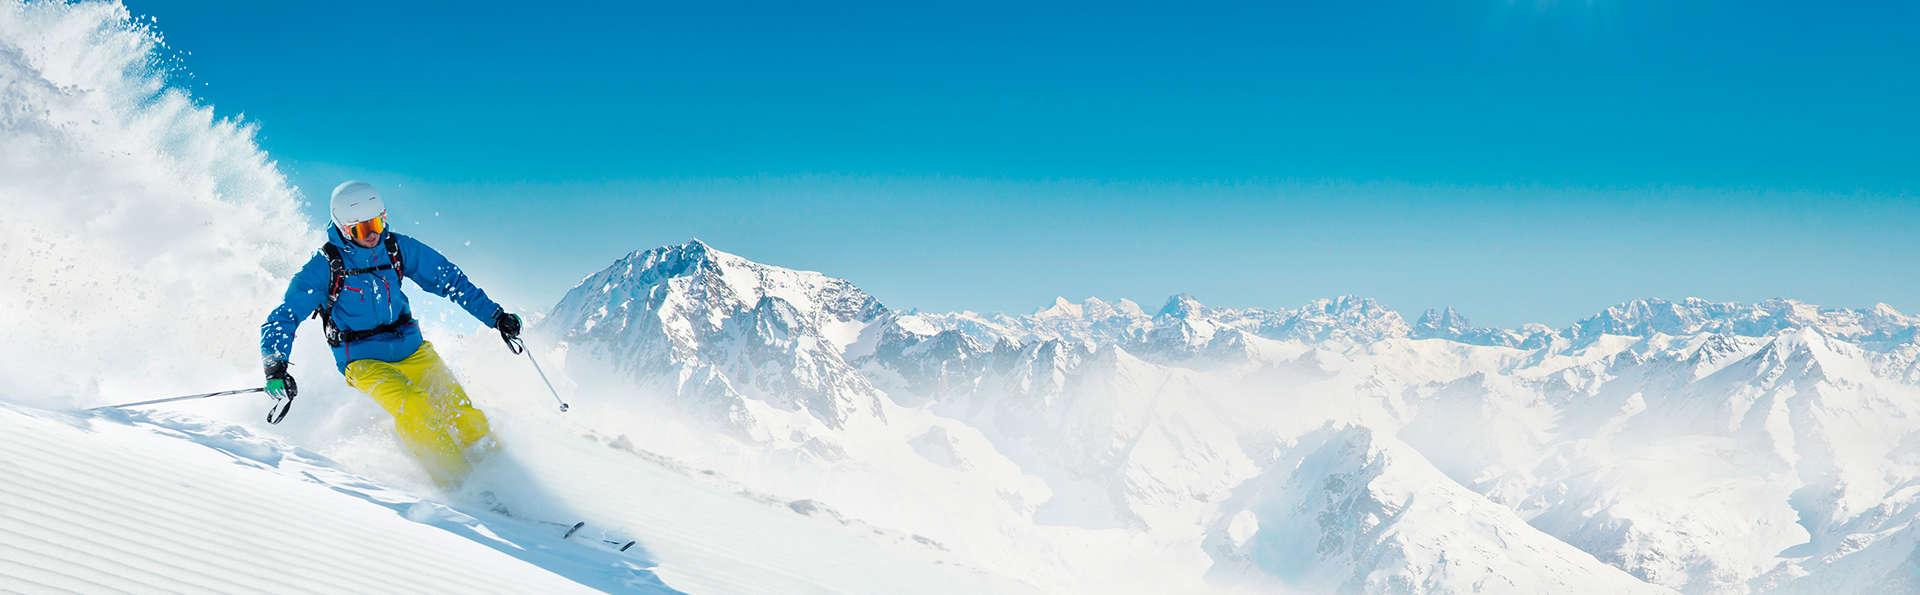 Vacancéole - Résidence l'Edelweiss - edit_ski_alps.jpg